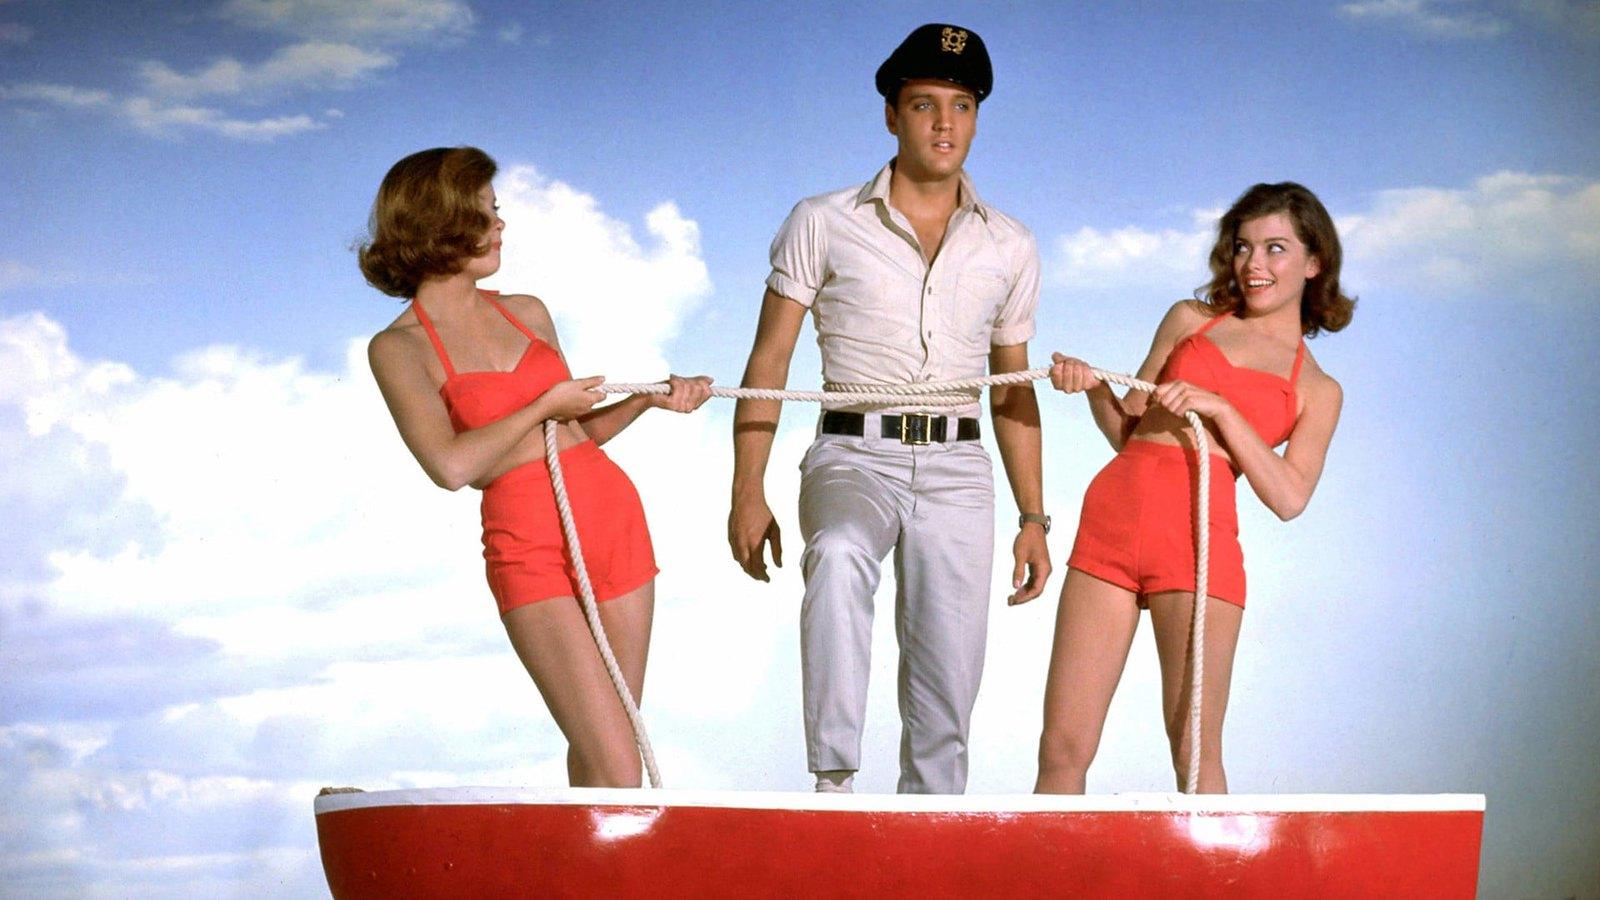 Promotional still image from Elvis Presley's film Girls, Girls, Girls released in 1960.